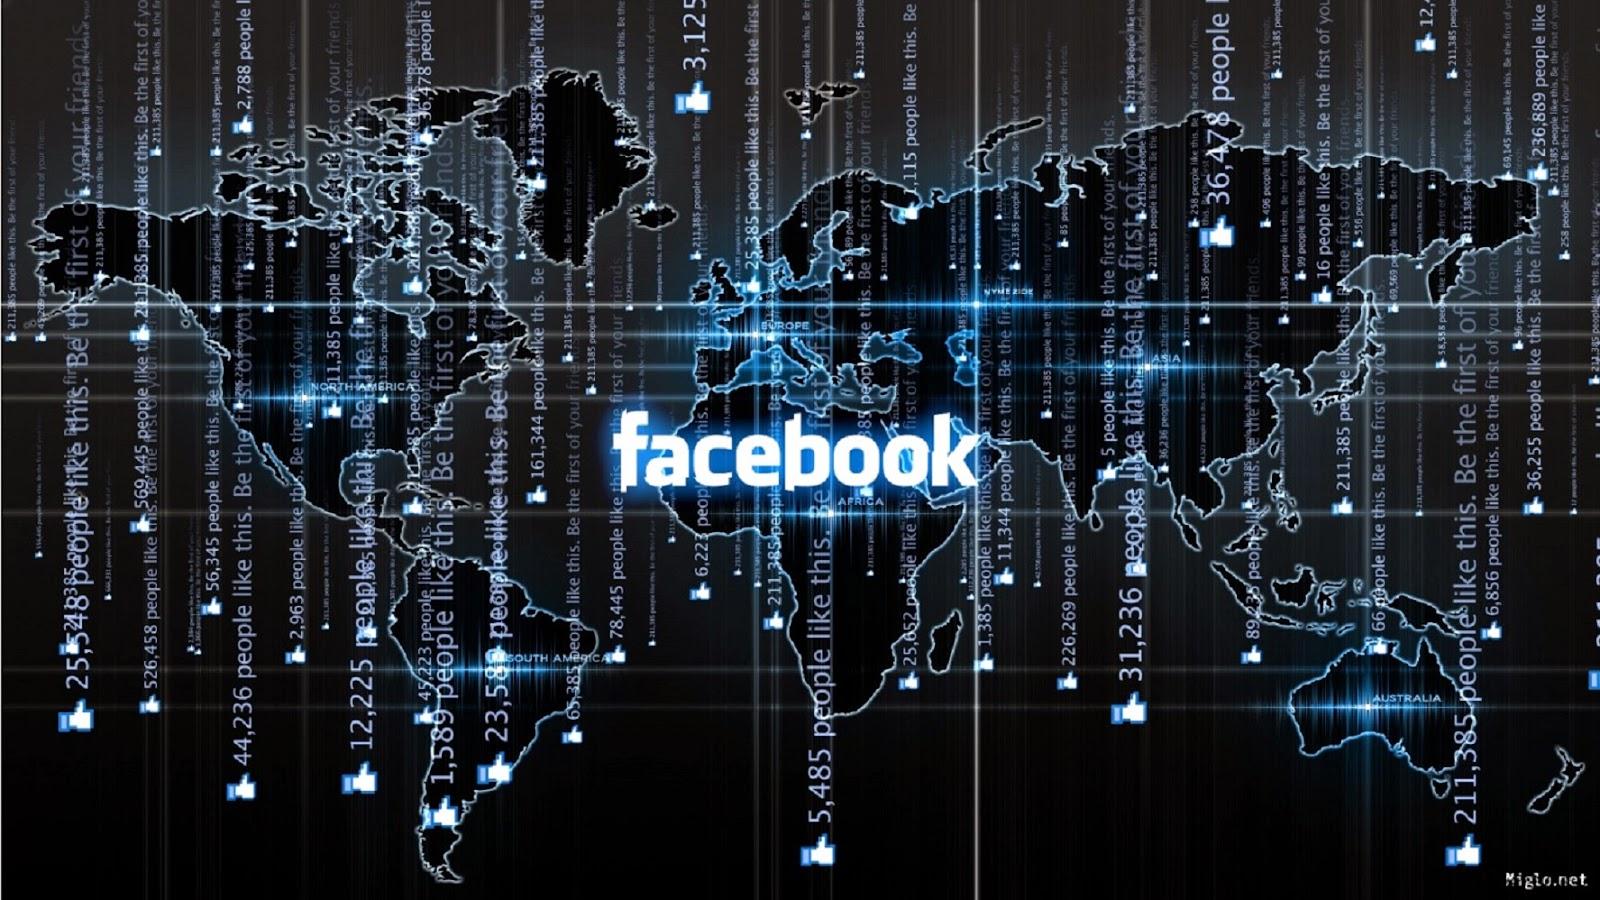 Facebook black login